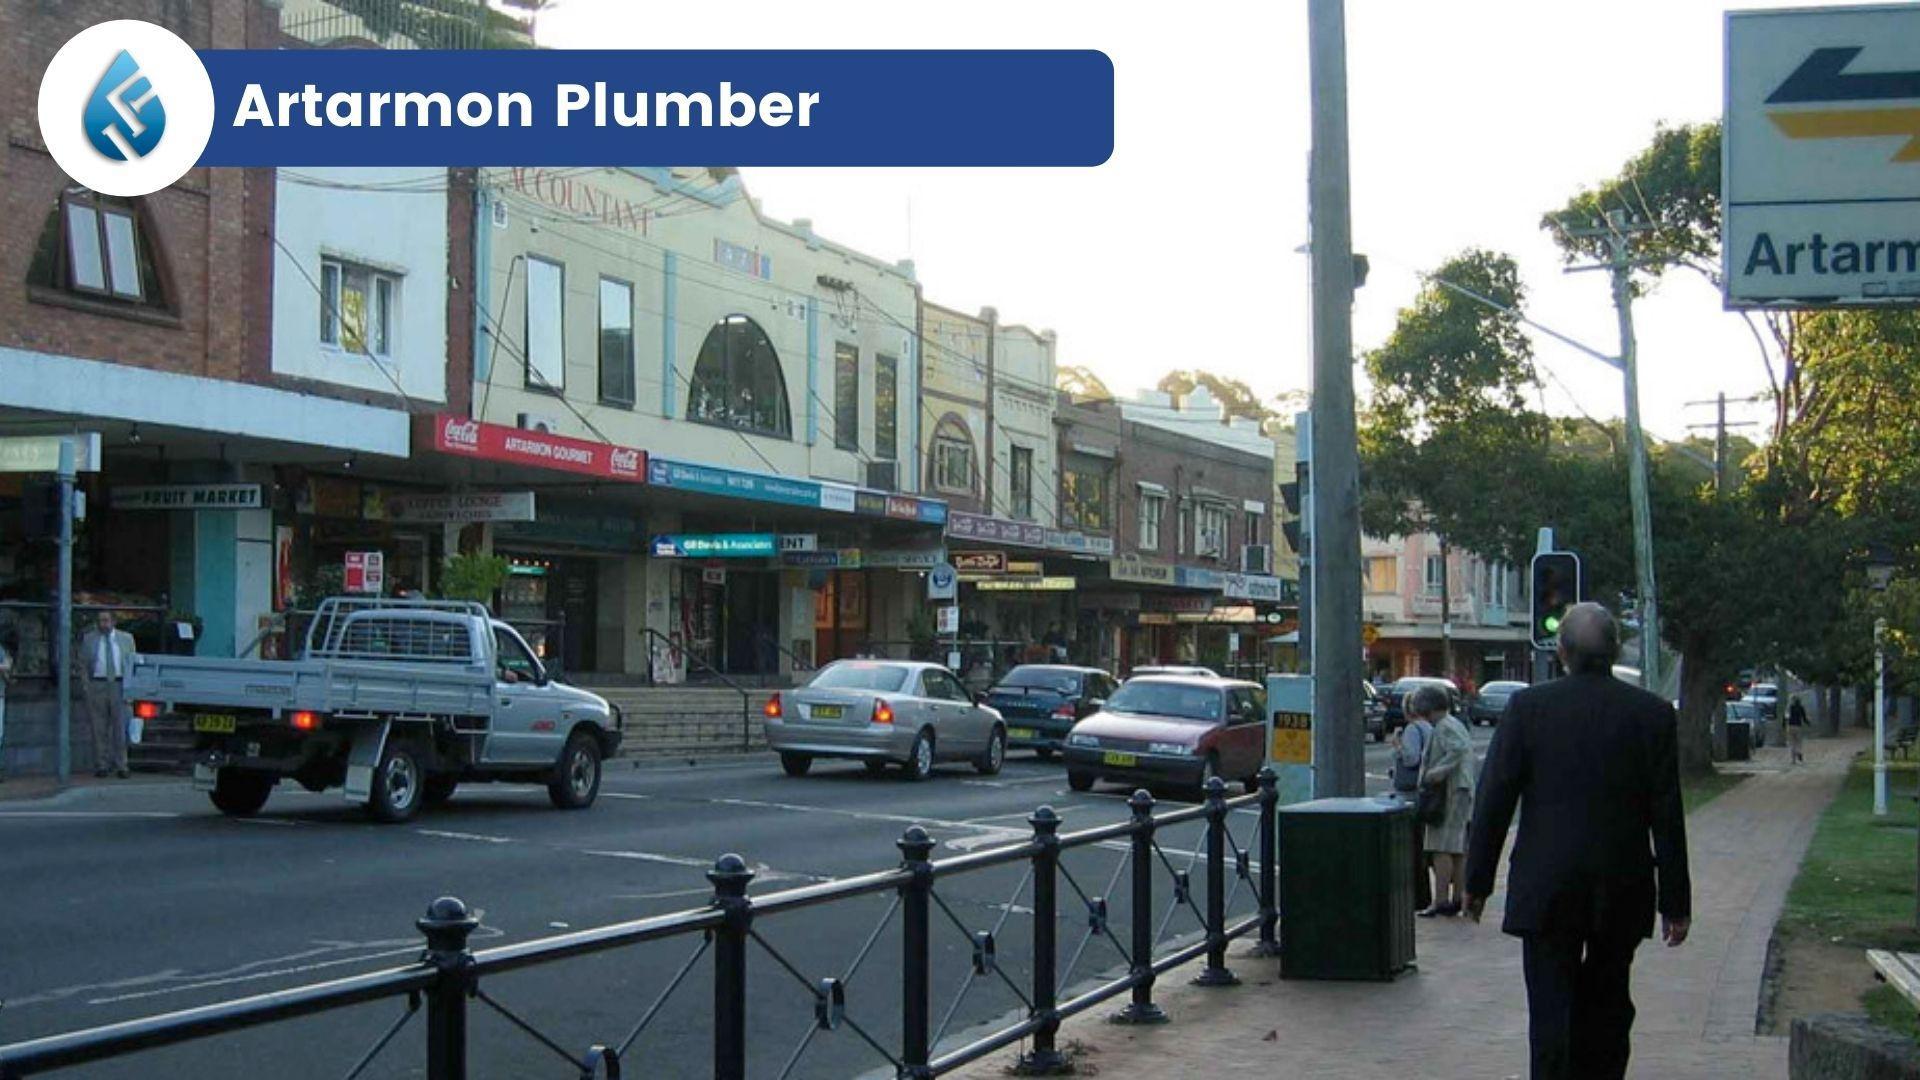 Plumber Artarmon